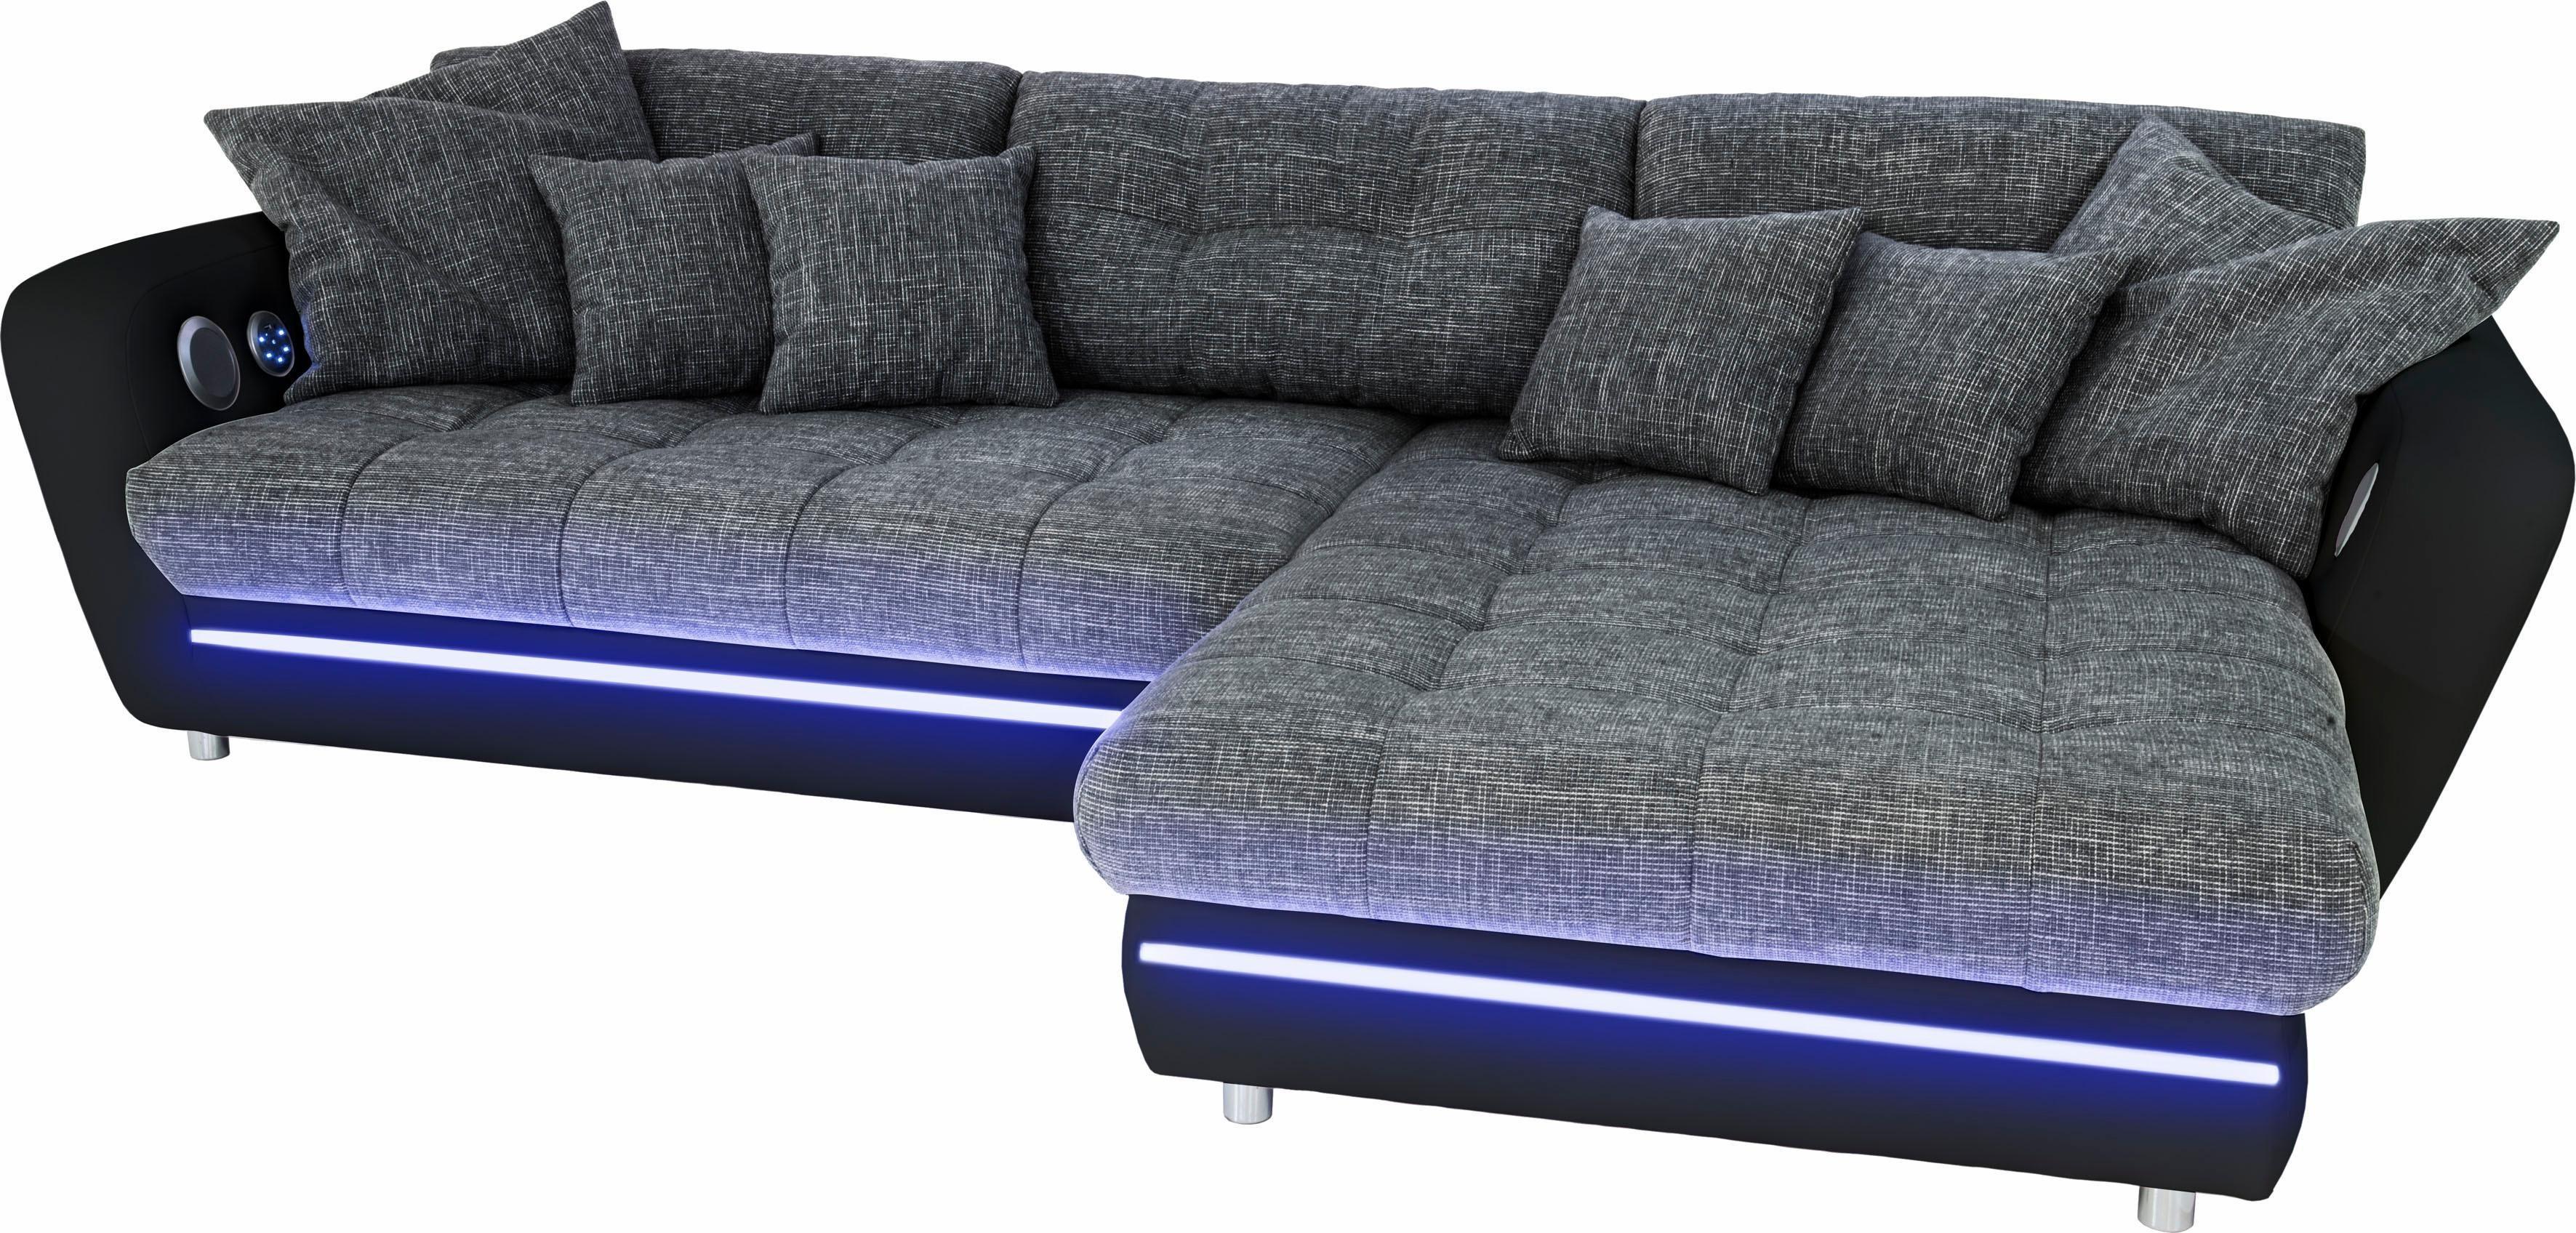 polsterecke wahlweise mit rgb led und bluetooth. Black Bedroom Furniture Sets. Home Design Ideas